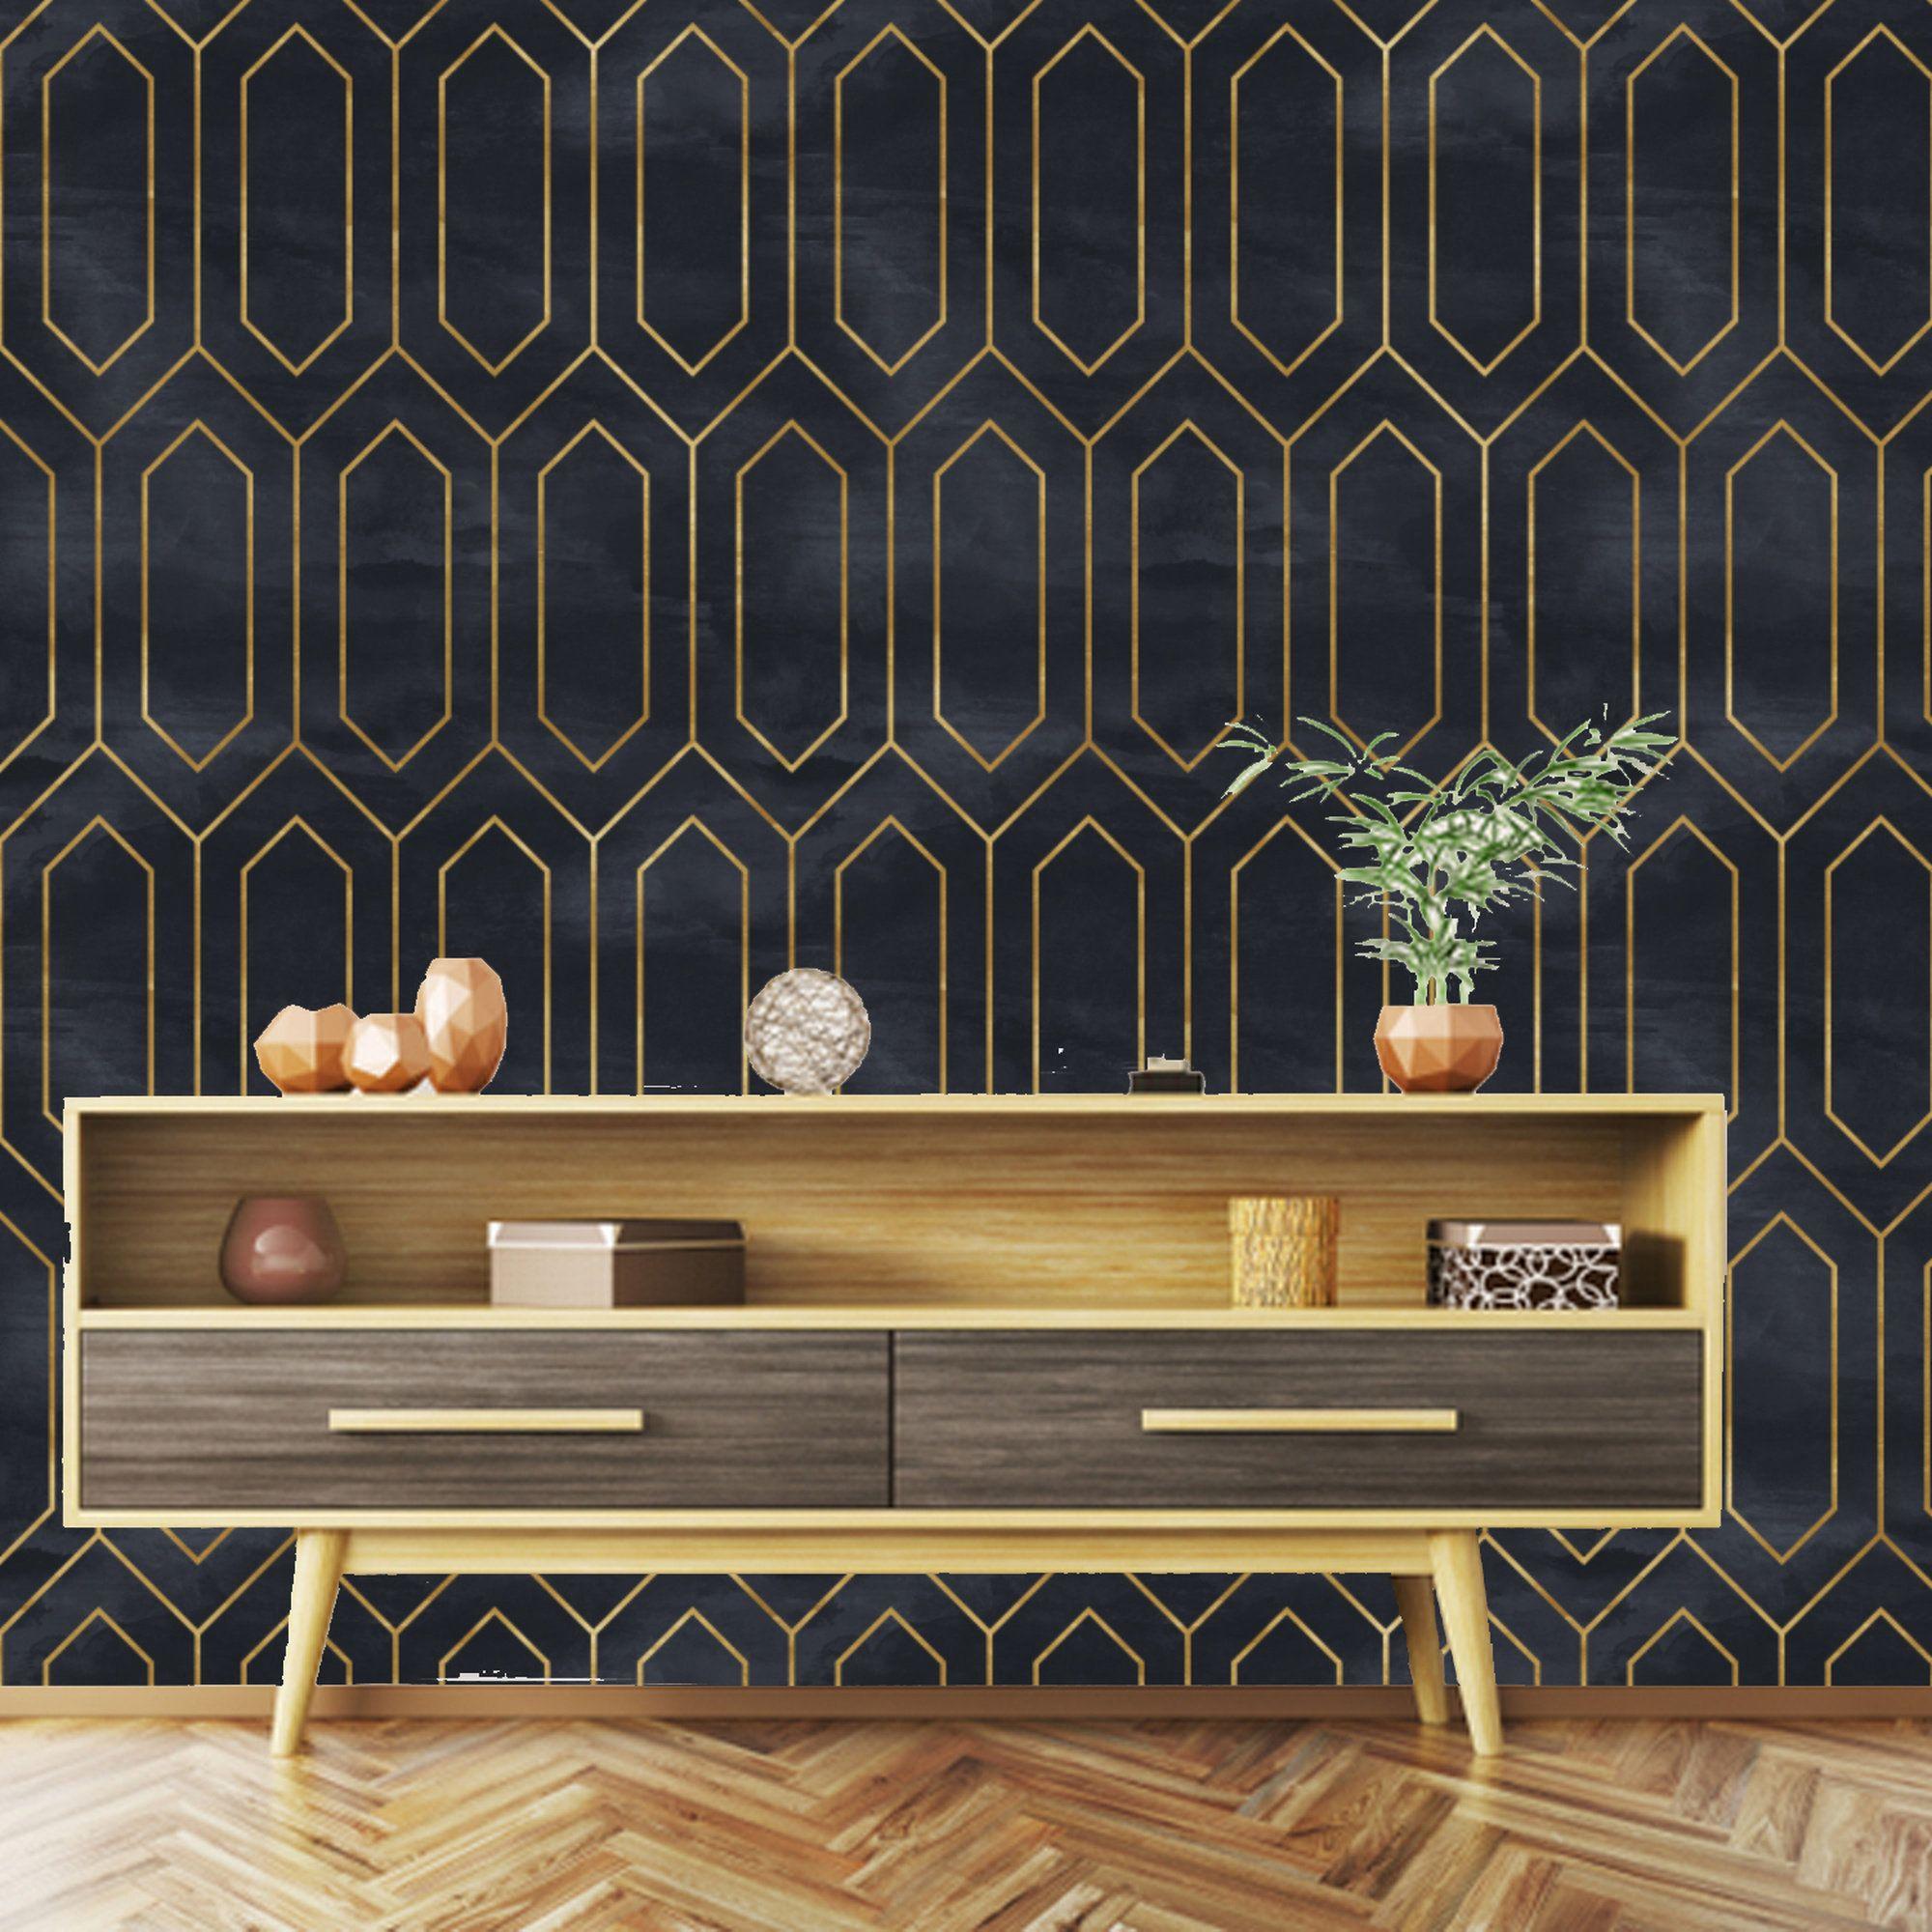 Geometric Art Deco Black Gold Wallpaper, removable peel